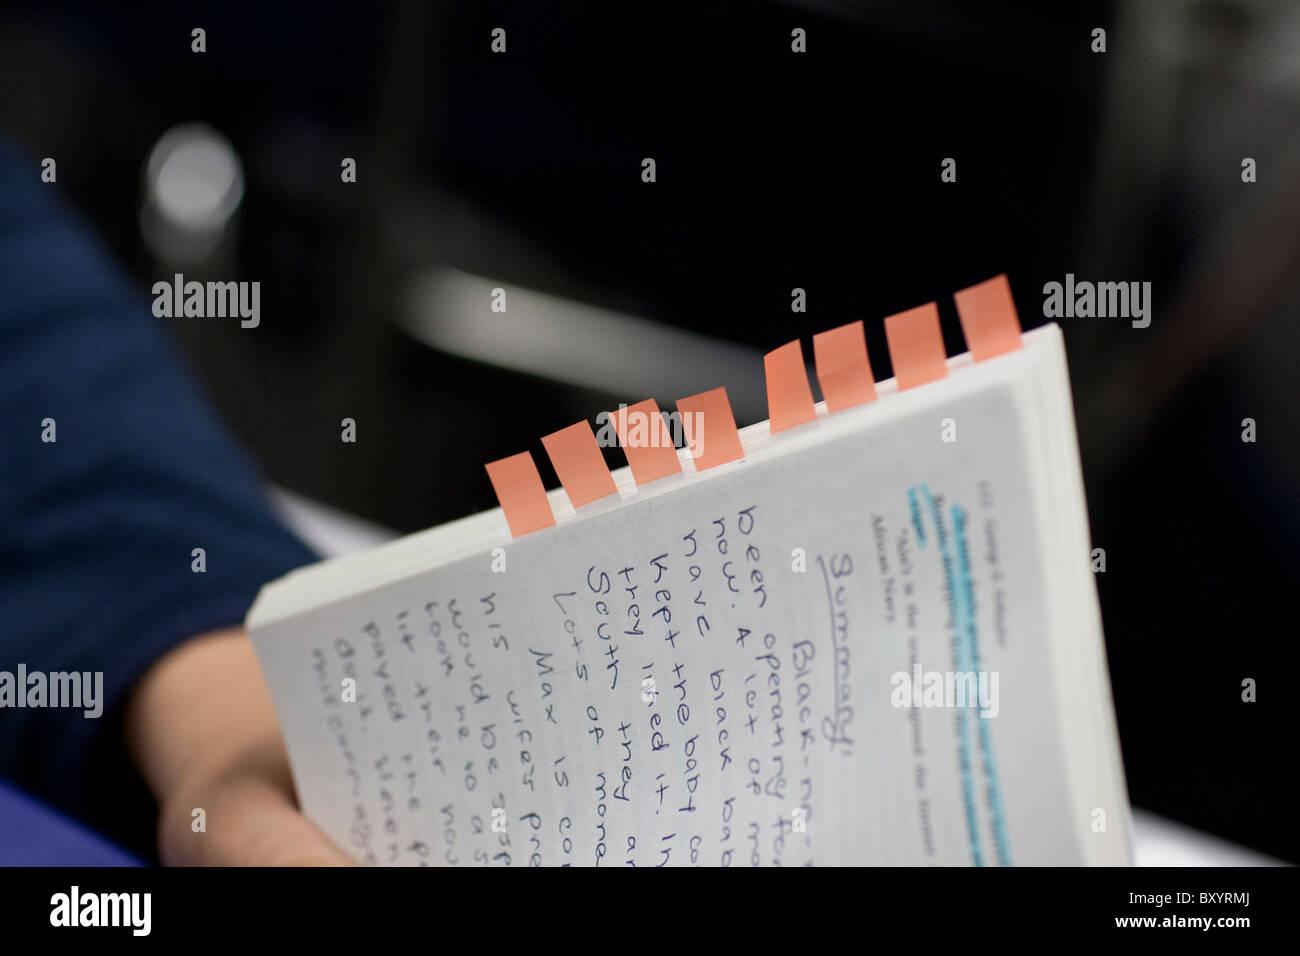 Estudiante posee copia de novela con texto resaltado, notas manuscritas y marcadores de tabulación de anotación Imagen De Stock